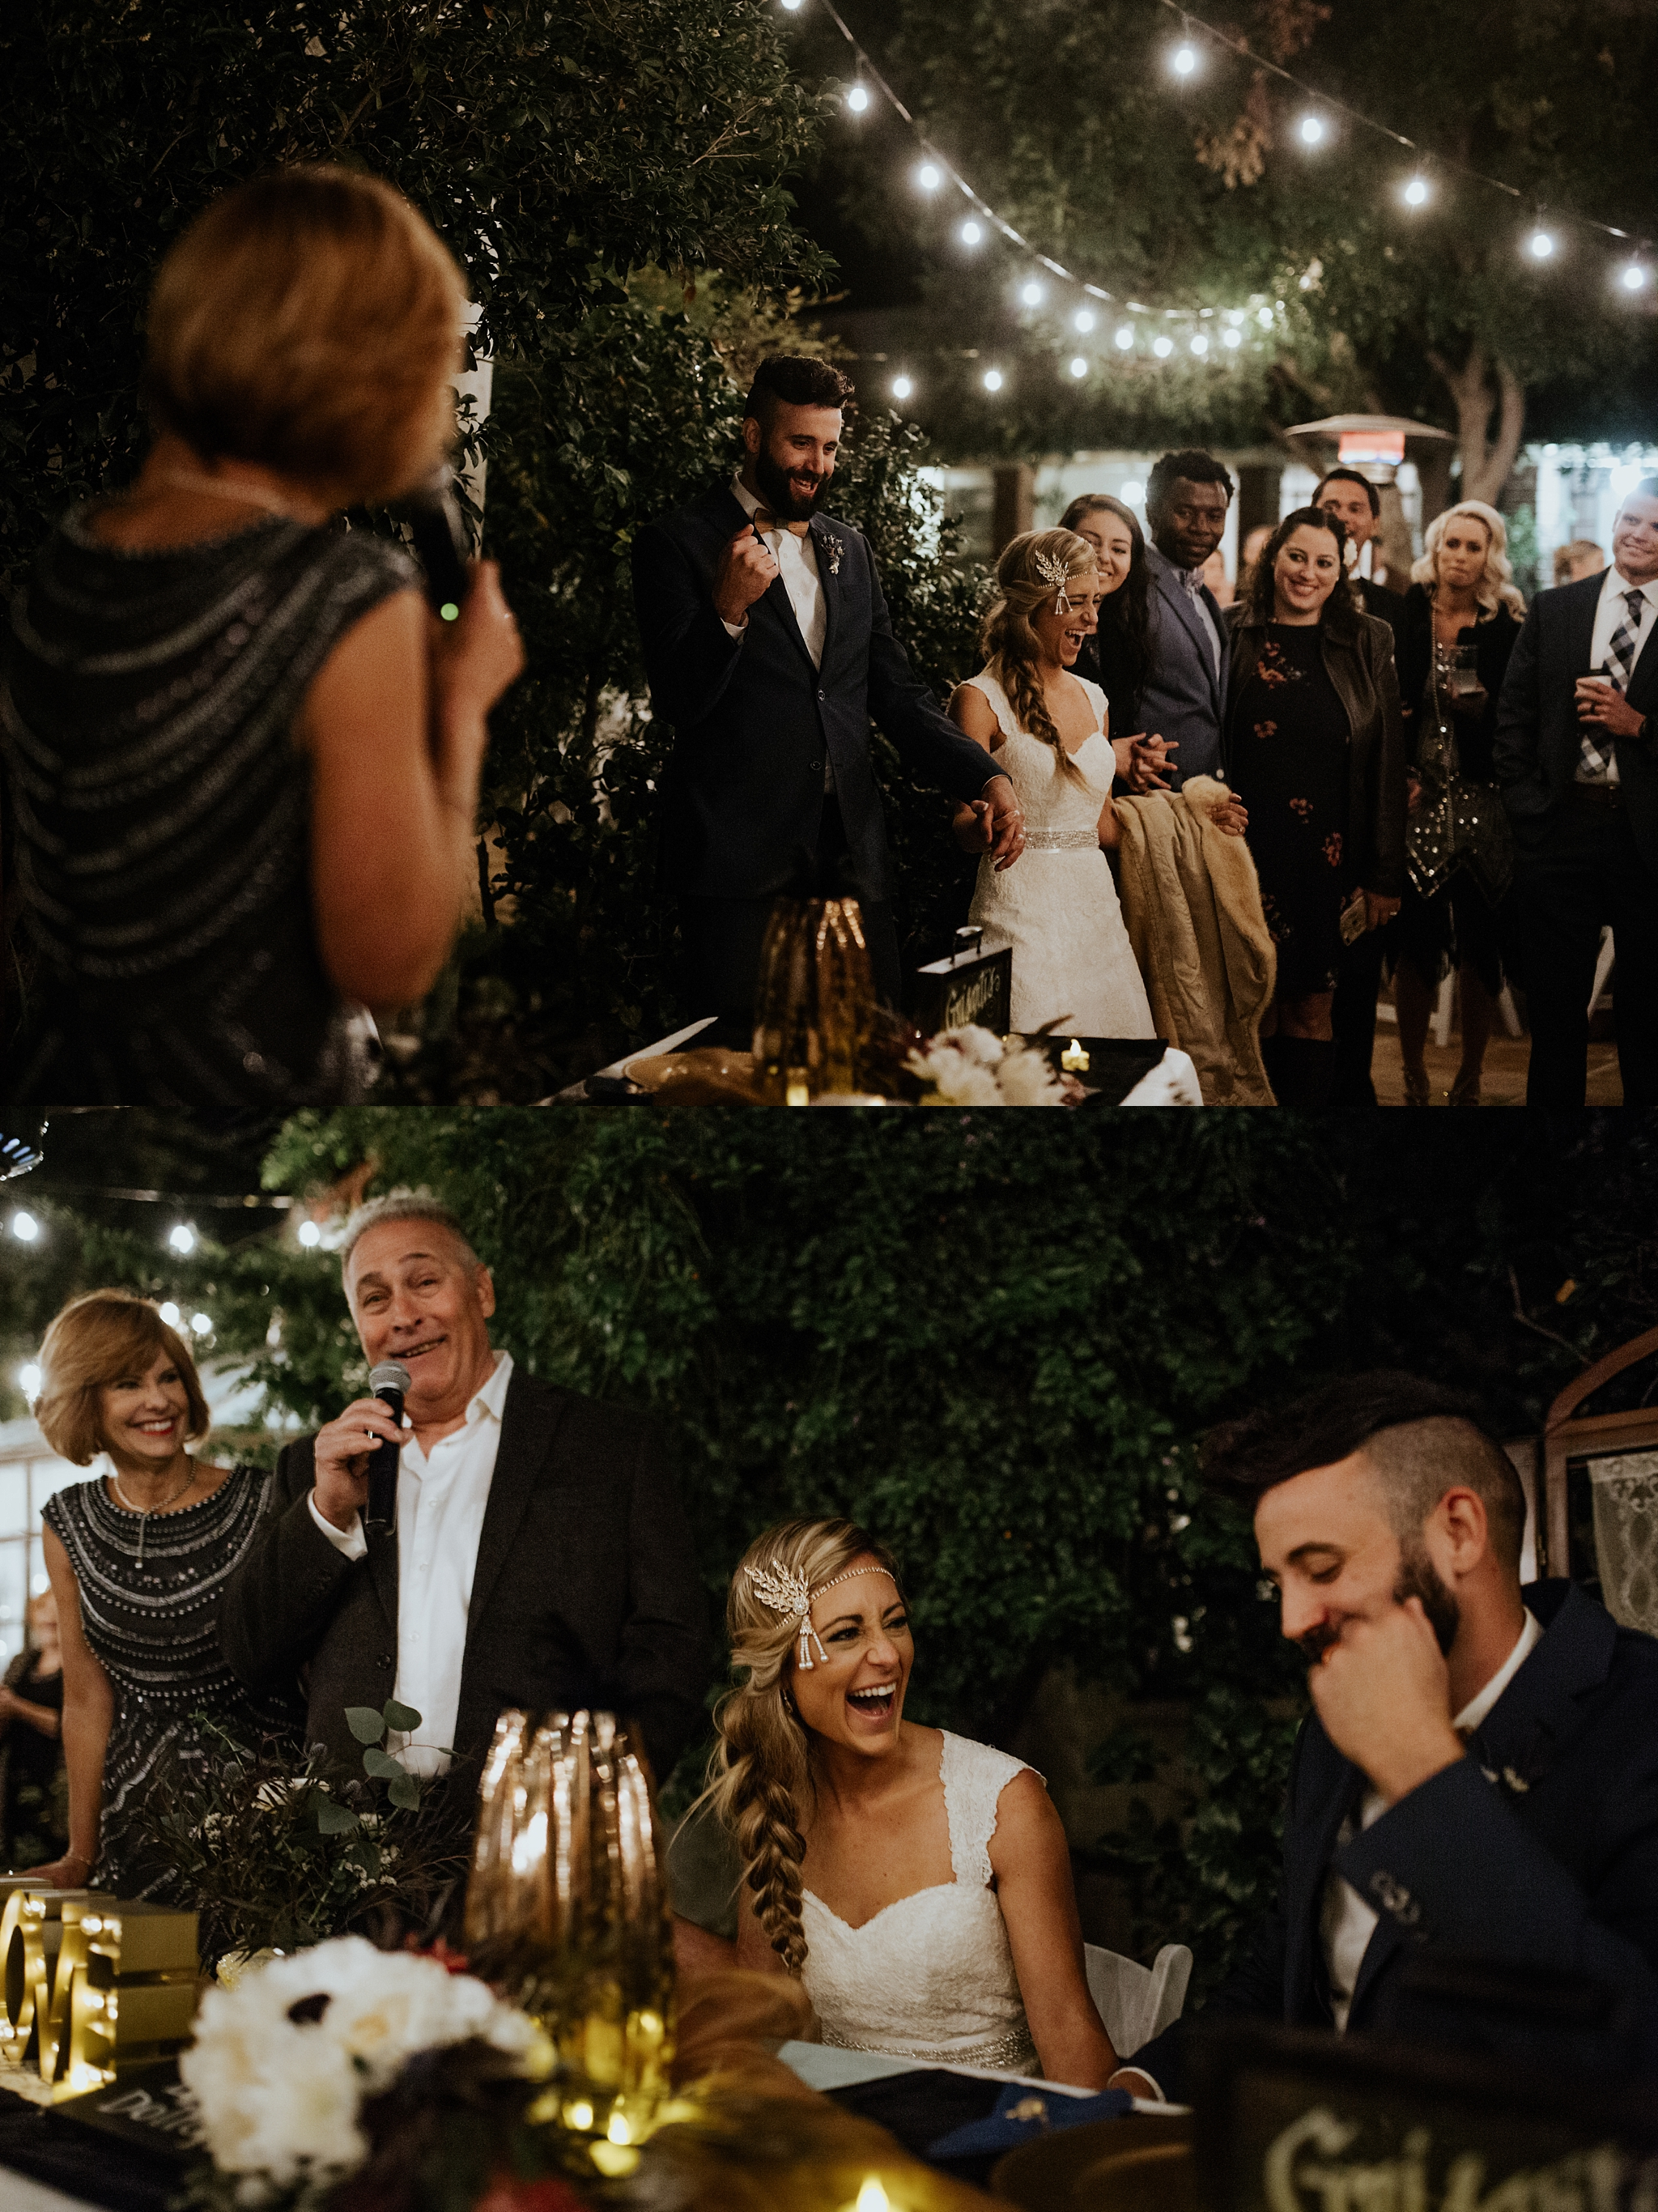 Bohemian Orcutt Ranch Wedding in Los Angeles California  - Los Angeles Californai Wedding Photographer_0060.jpg